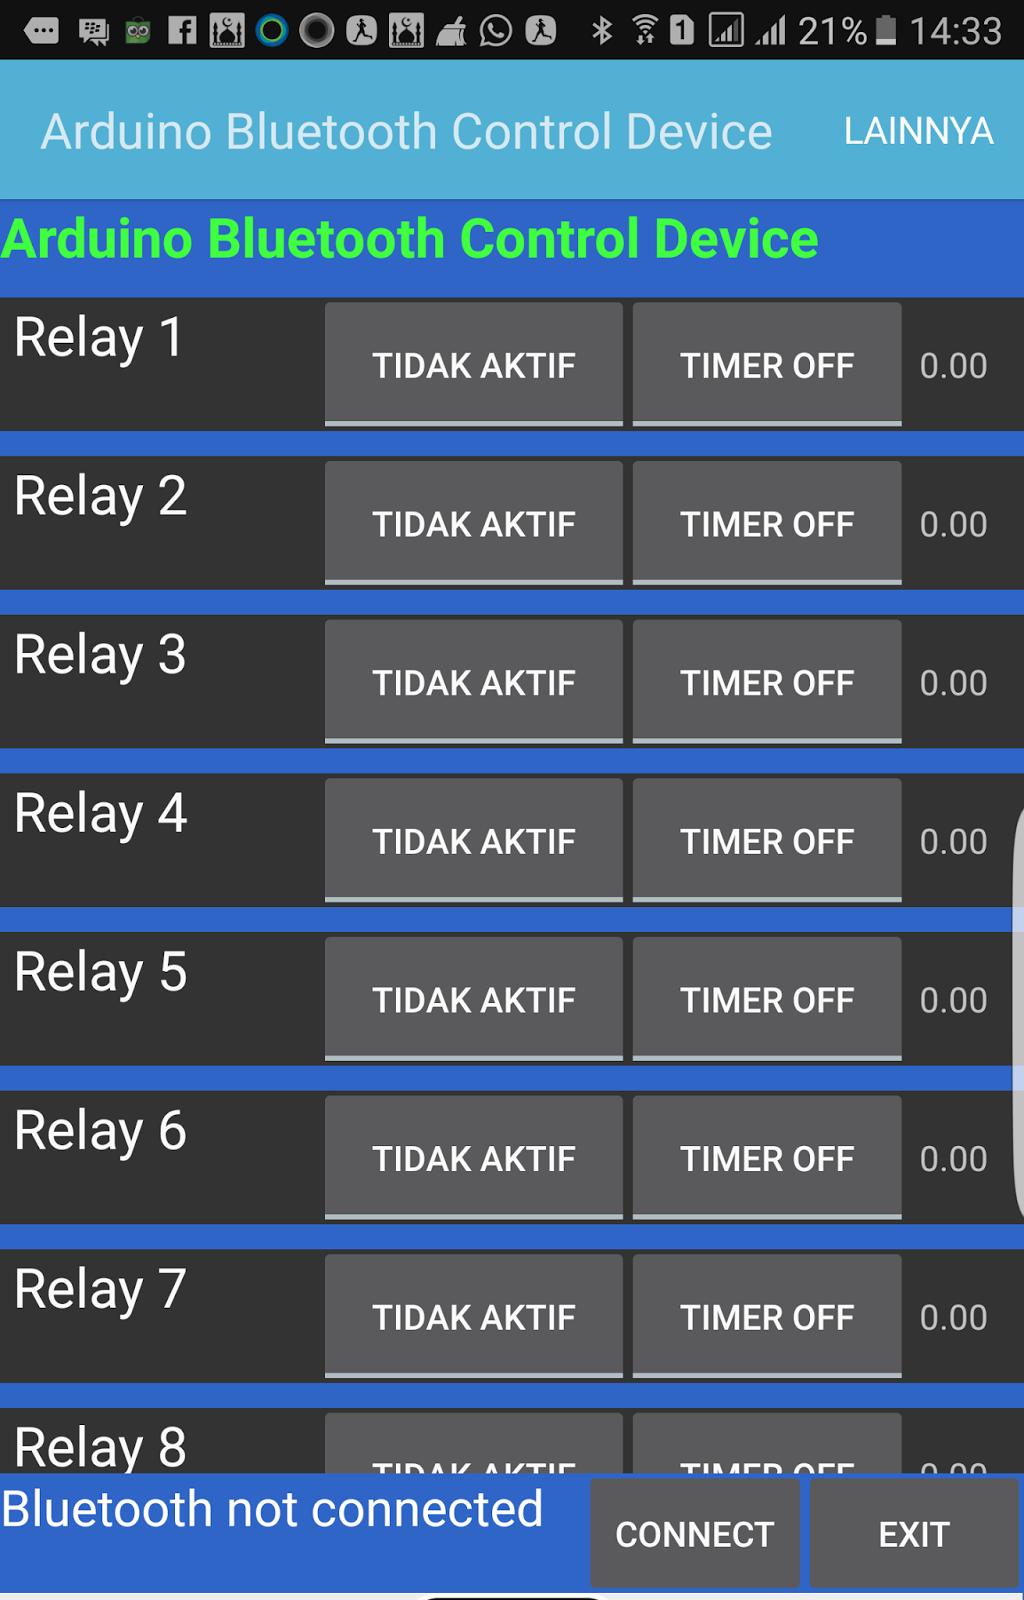 Control 8 Channel Relay With Bluetooth Eeprom Belajar Arduino Rangkaian 5 Pin Berikut Screen Shoot Aplikasinya